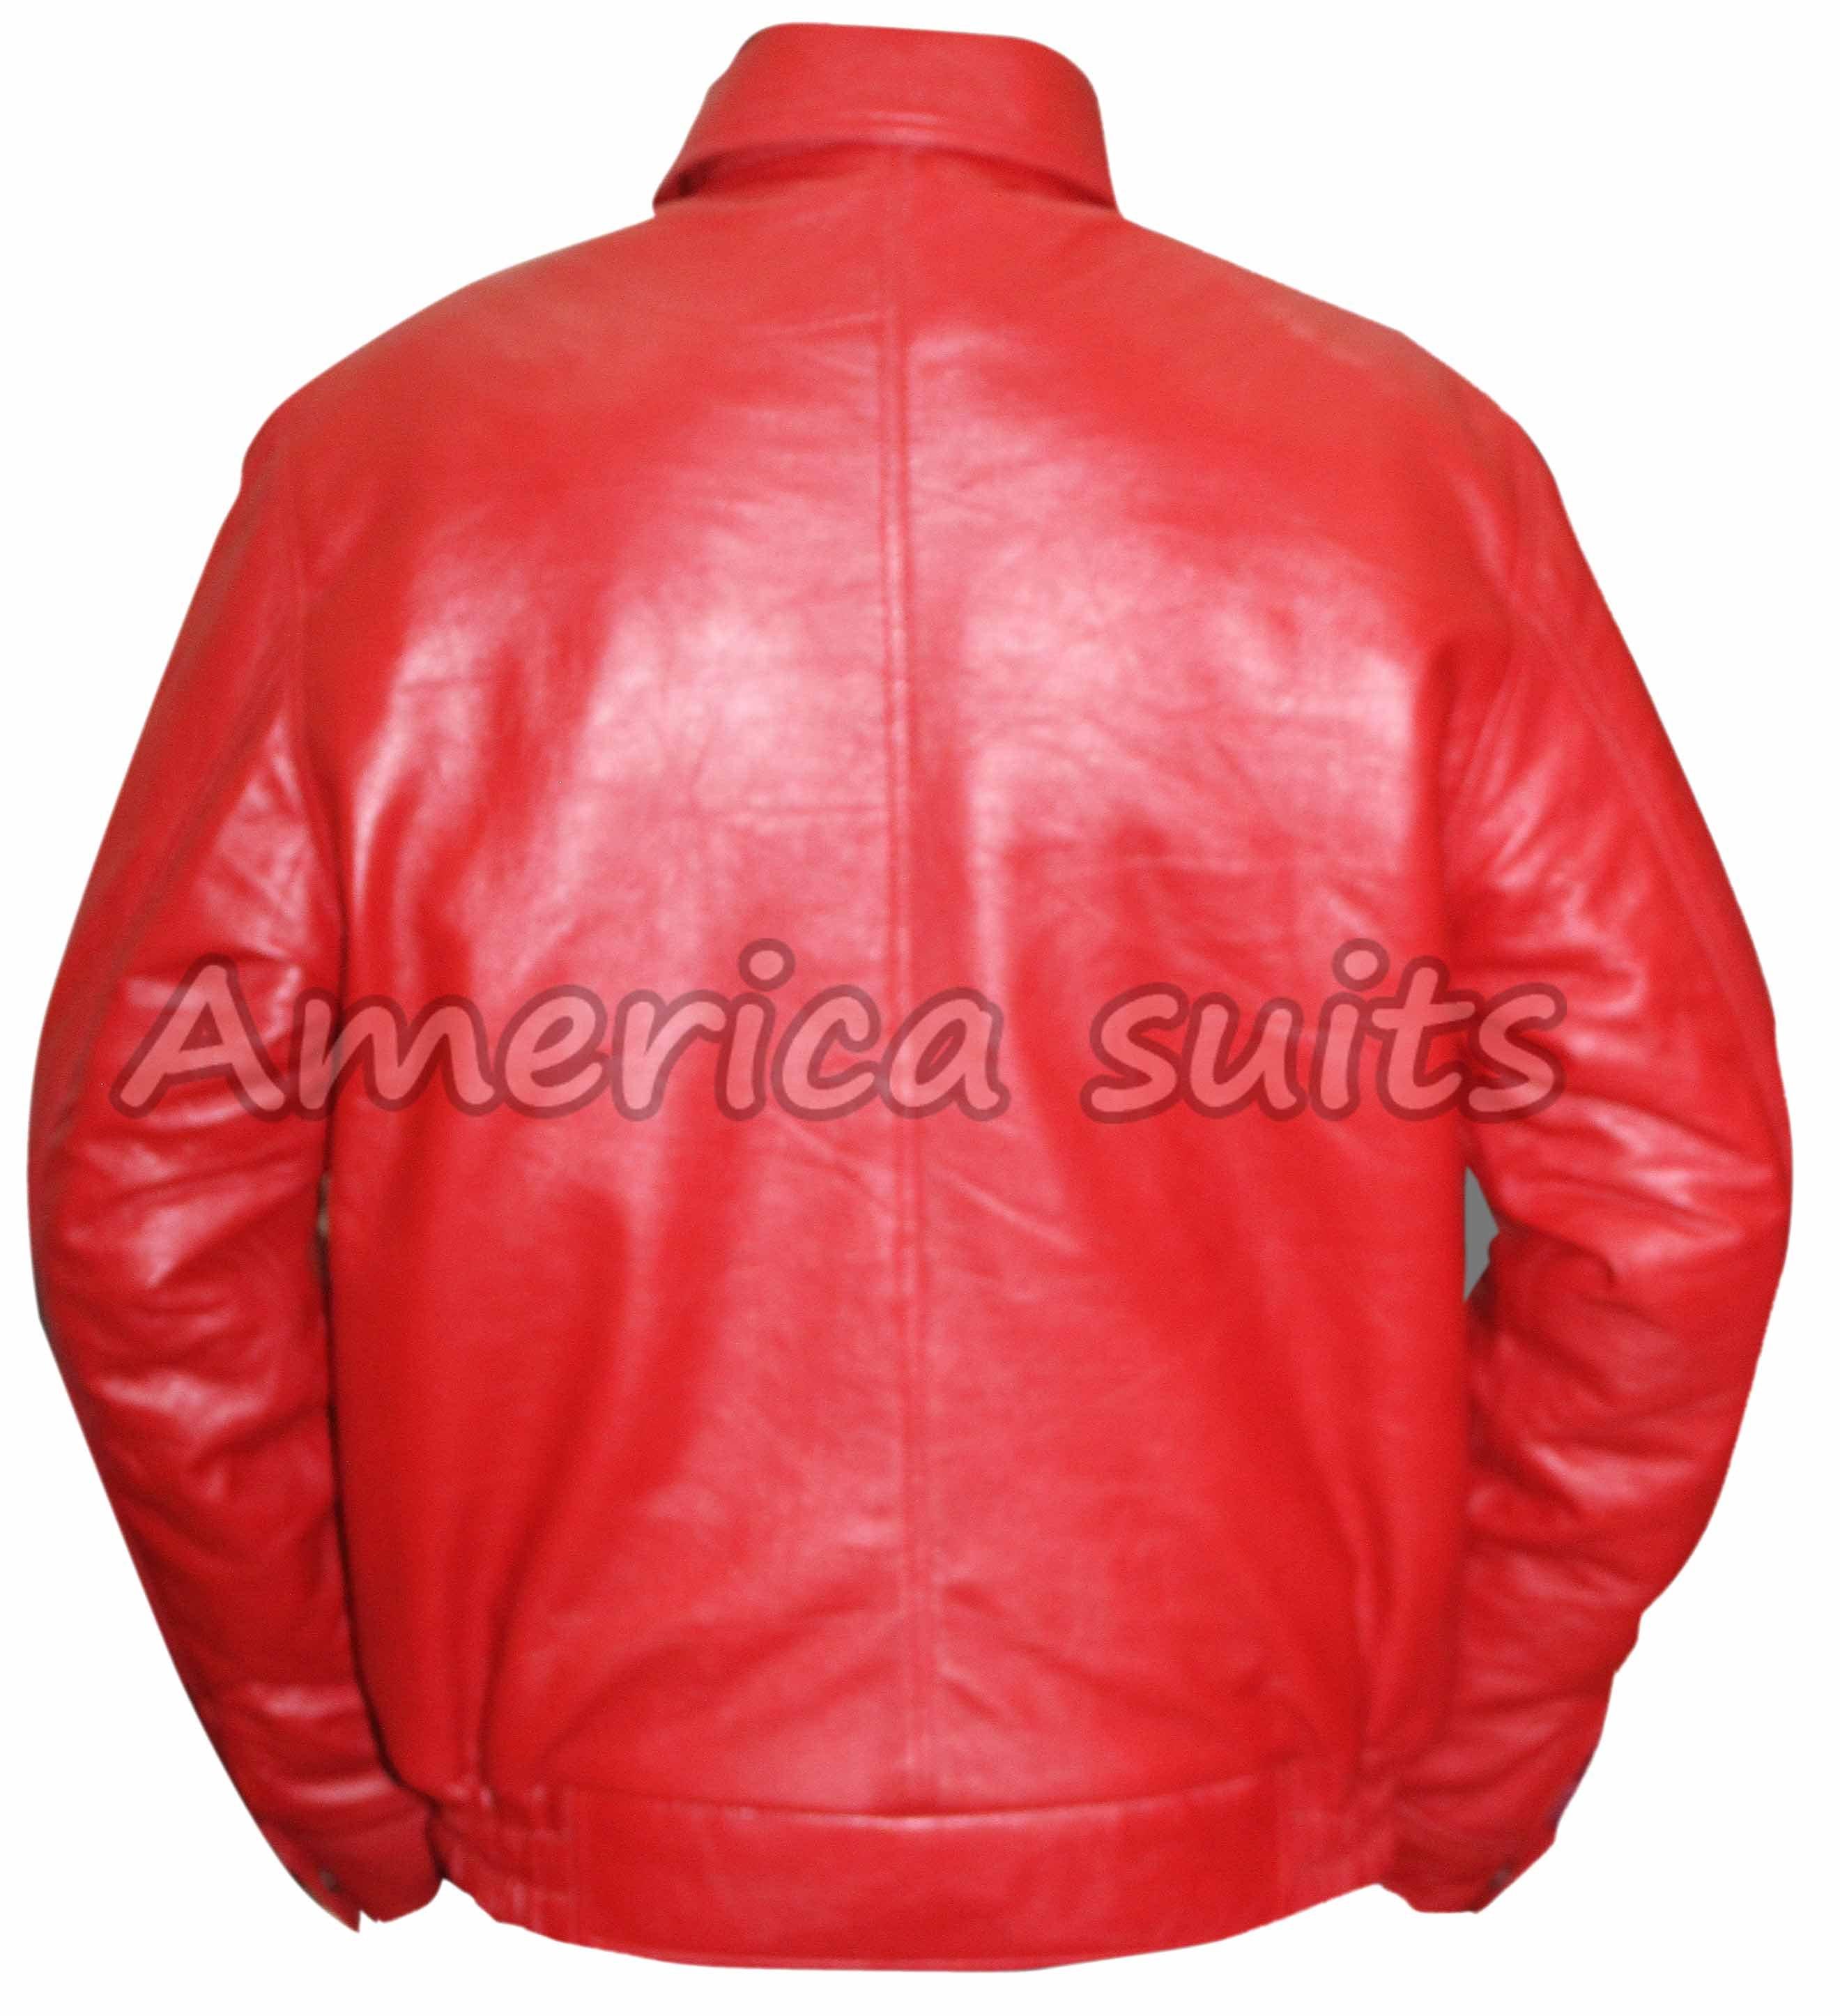 James Dean Leather Jacket